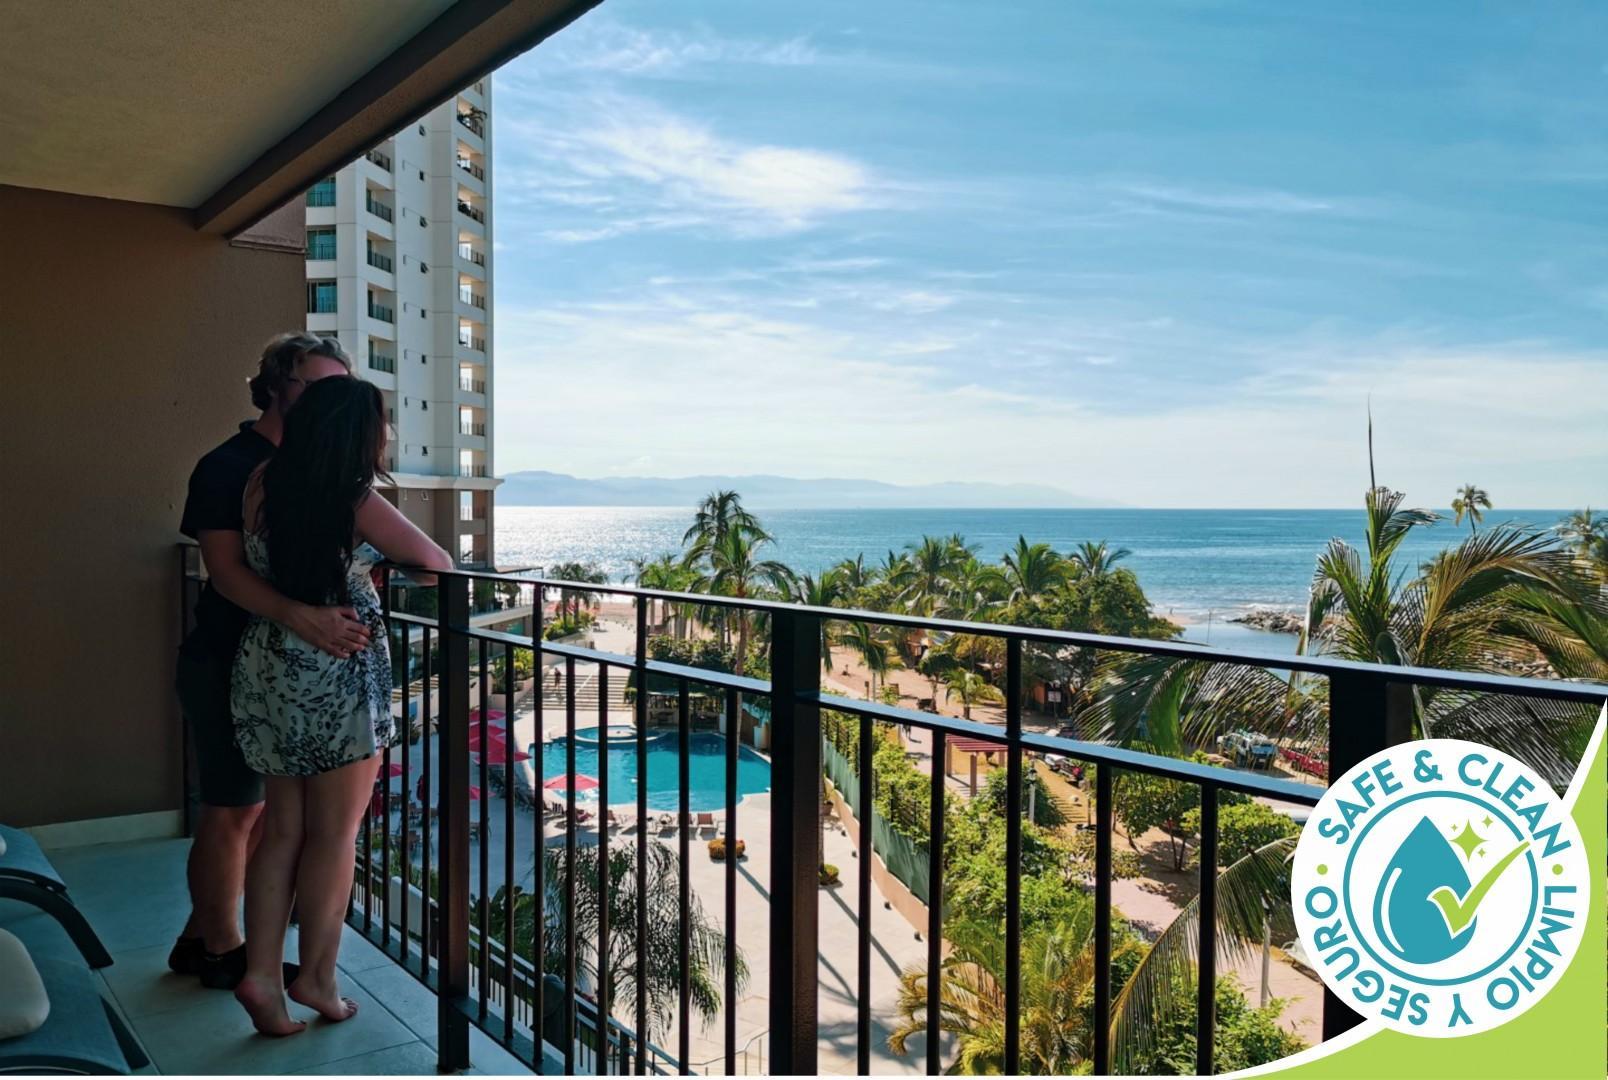 Ocean View Condo 1Bd 2Ba | Huge Terrace, Beachfront Pools, Gym, BBQ